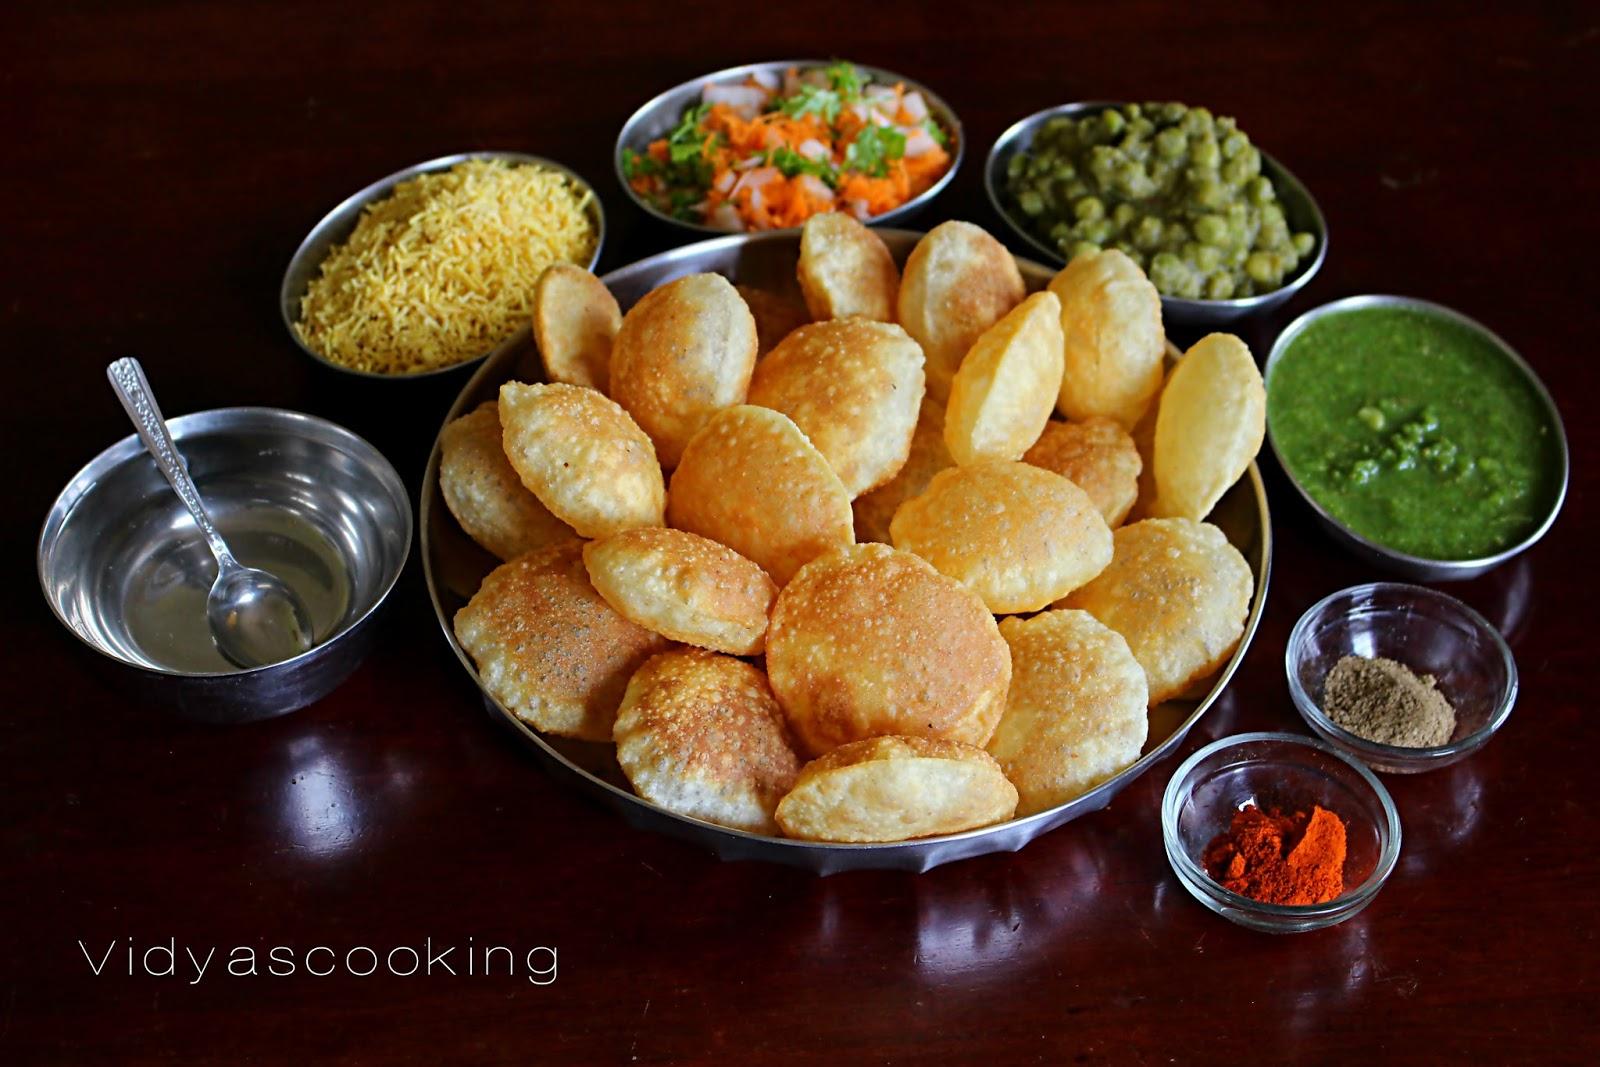 Vidyascooking step by step bangarpet pani puri recipe by vidyalakshmi first step prepare clear pani forumfinder Choice Image